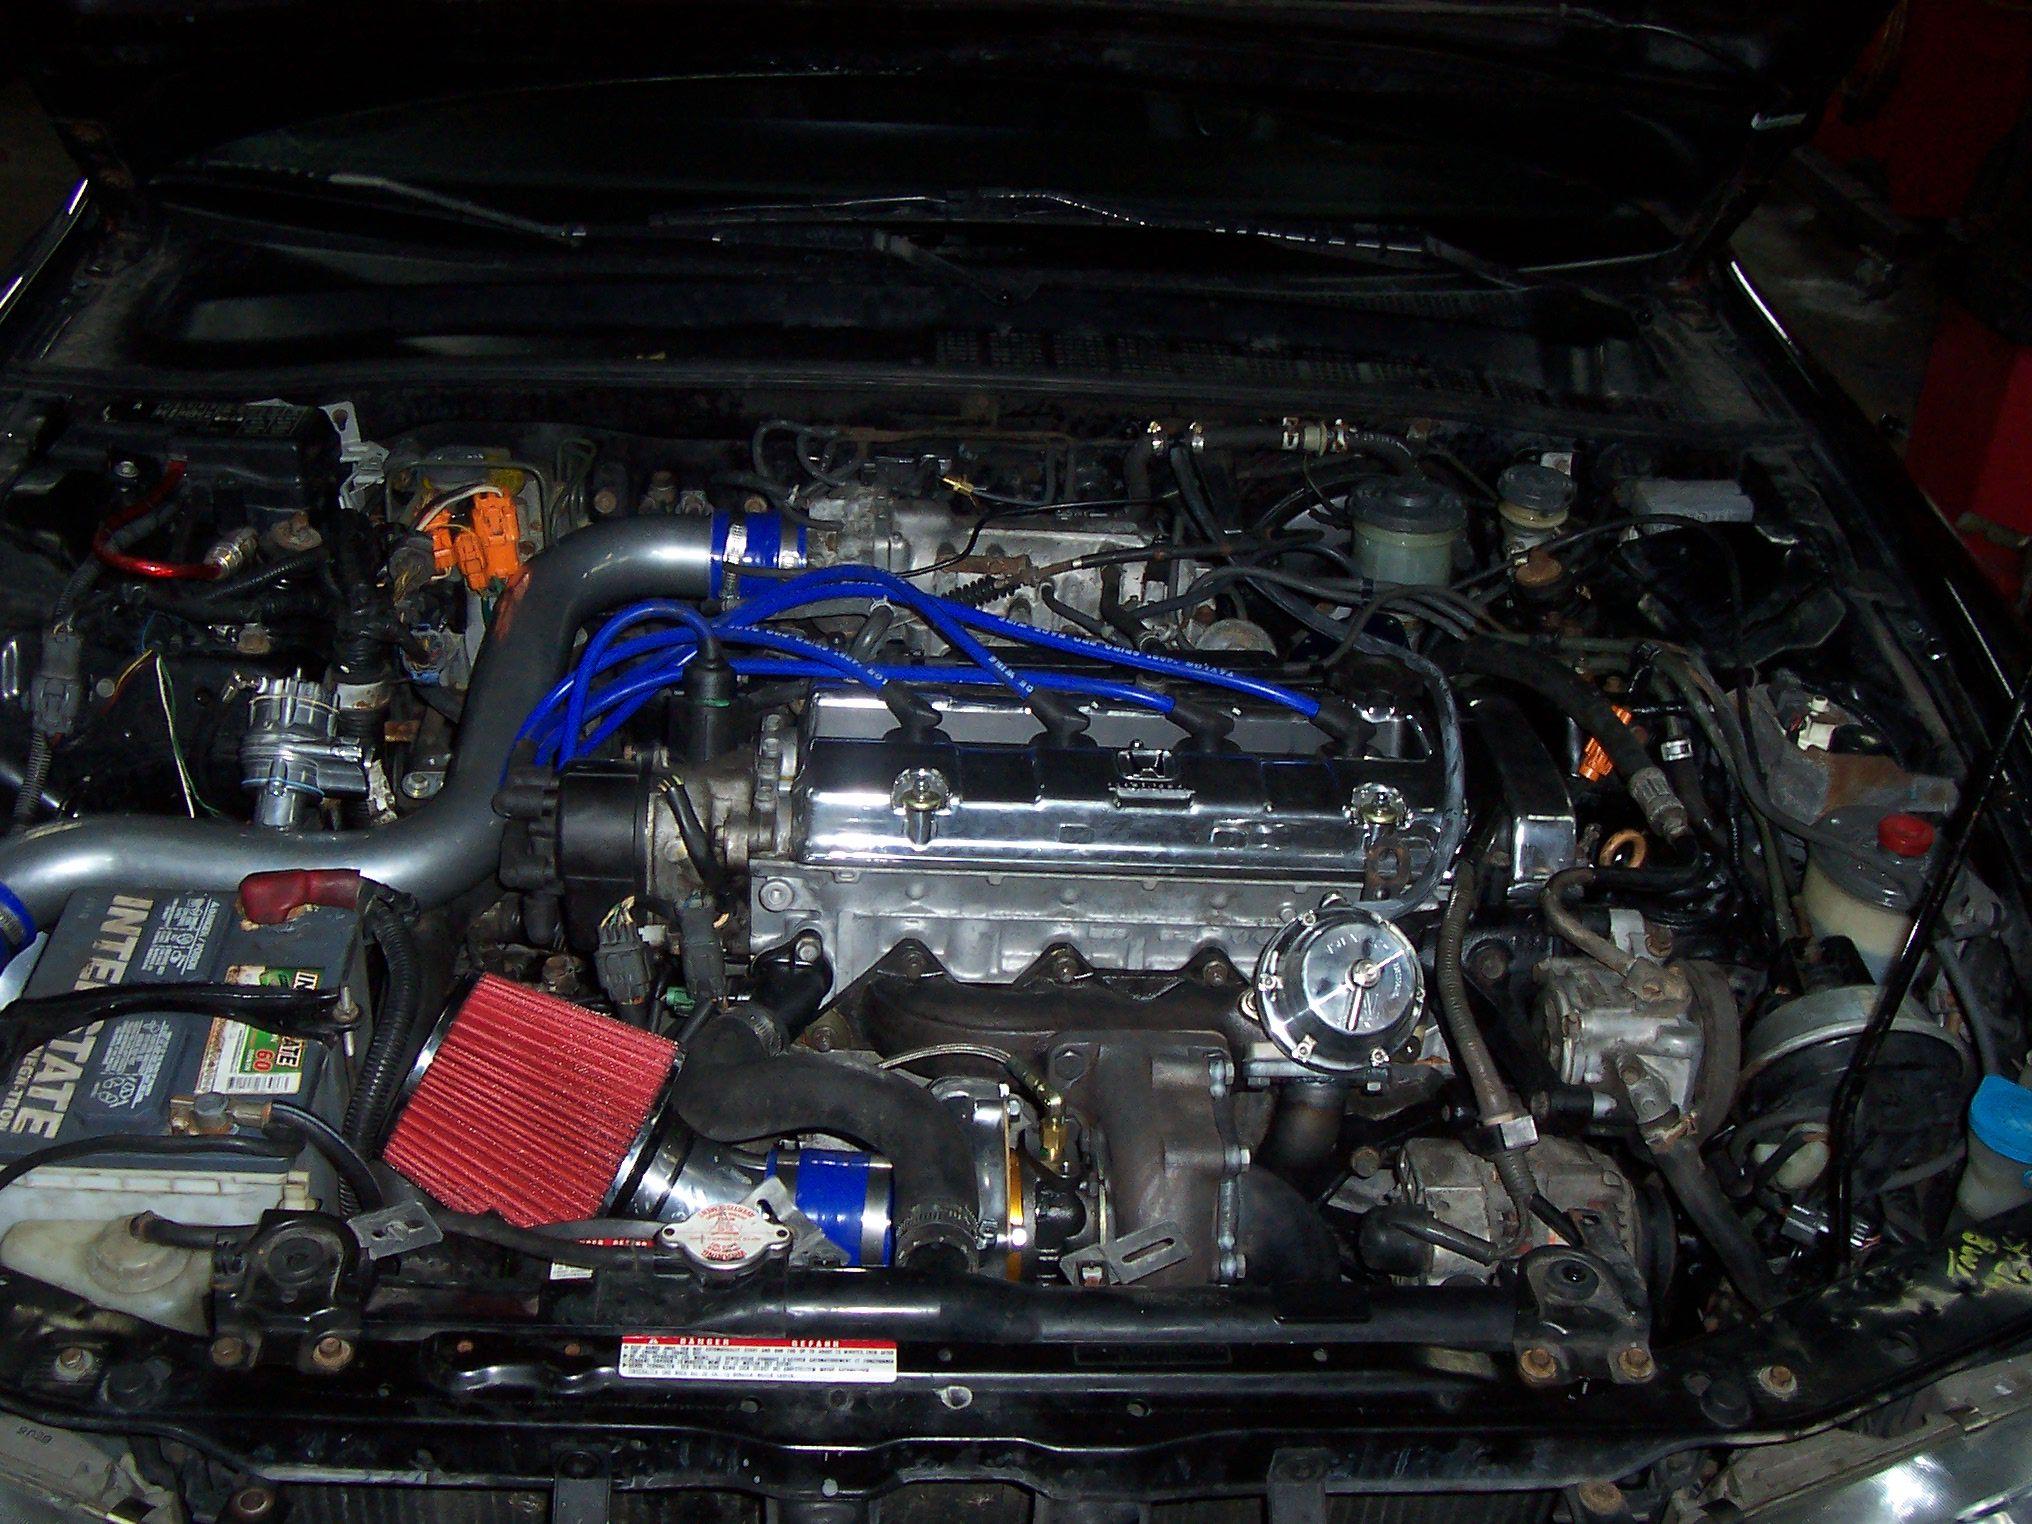 1992 Honda Prelude Si Turbo Hondaswap Vtec 100 0755